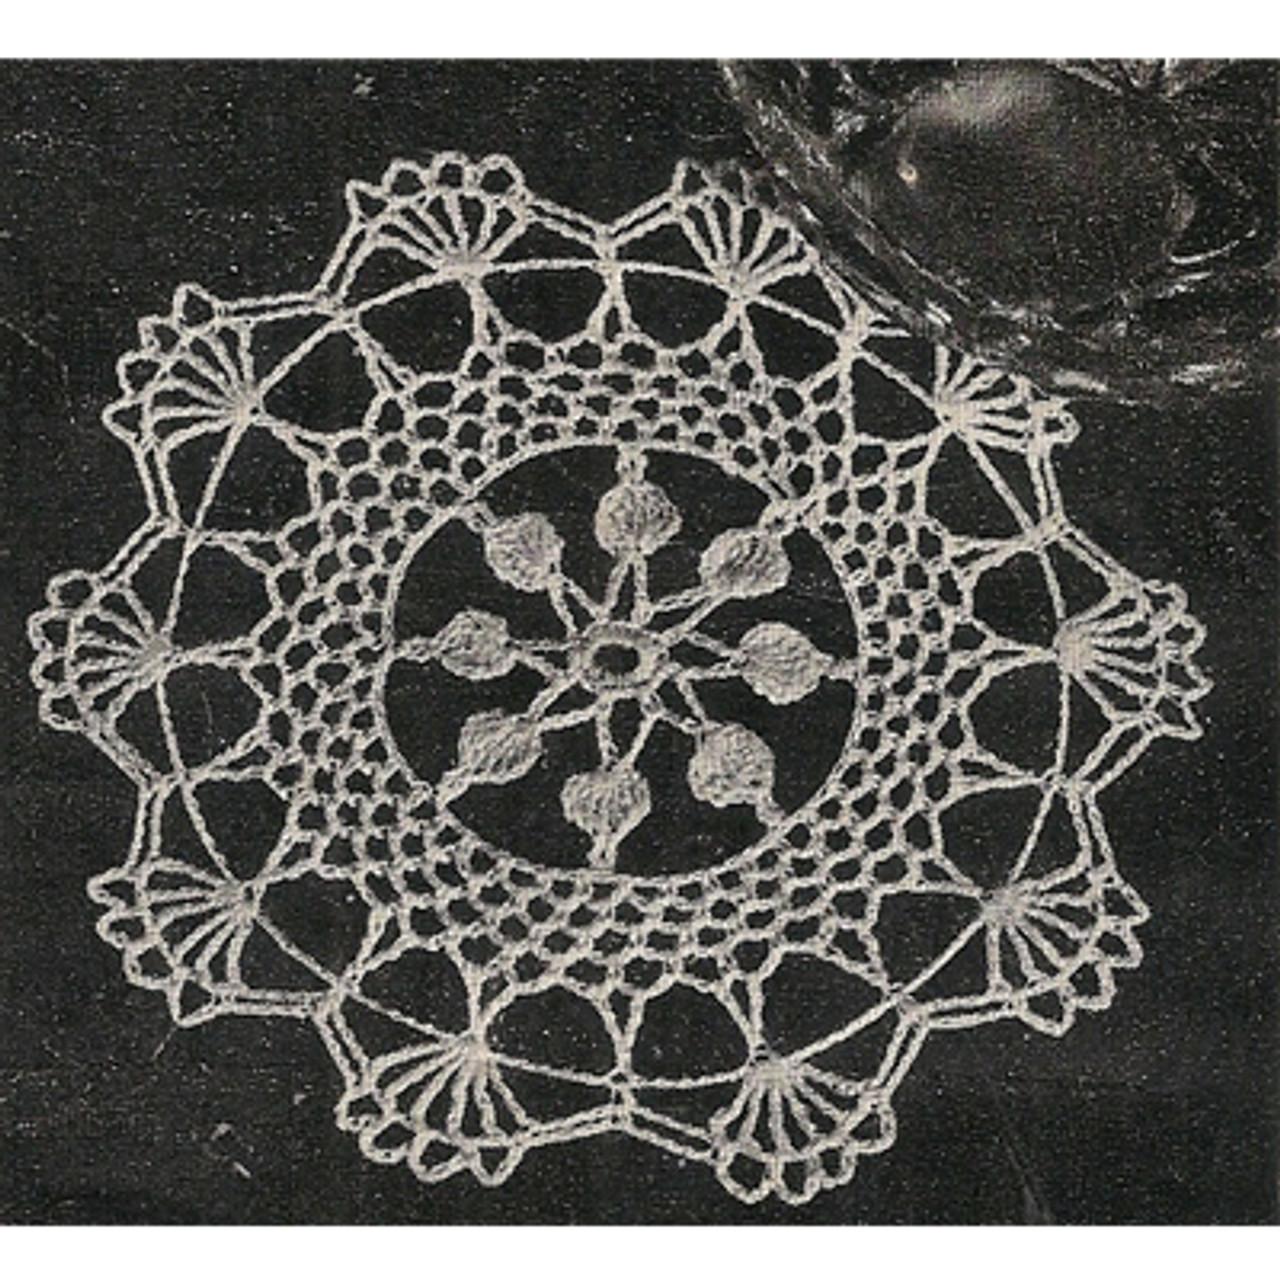 Scalloped Shell Crochet Doily Pattern